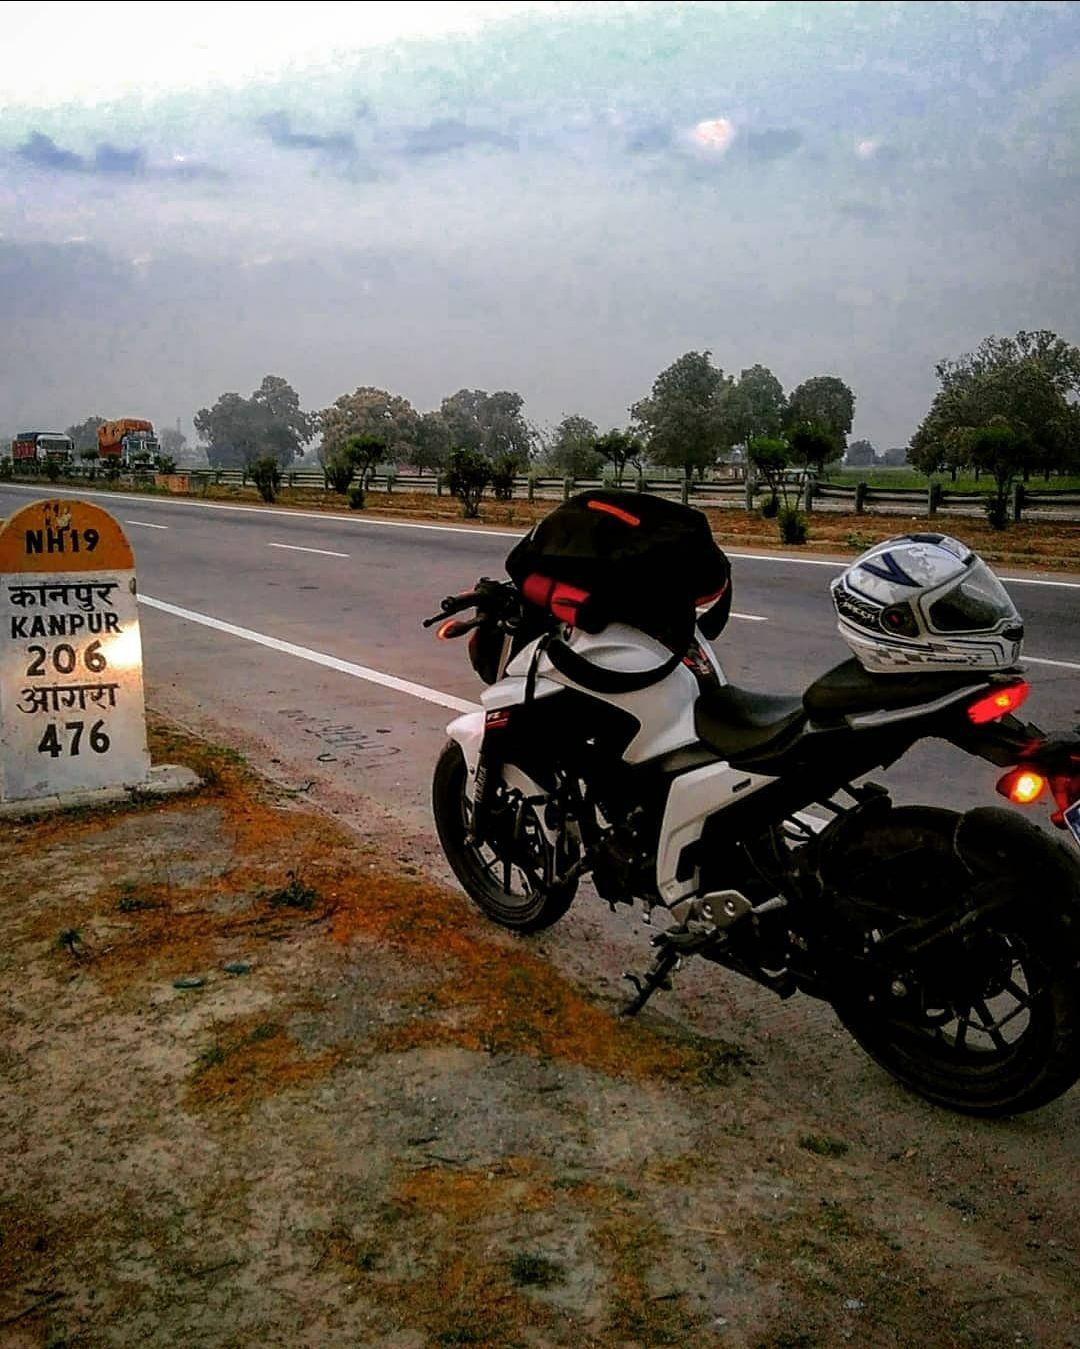 Photo of Allahabad - Kanpur Highway By Ashutosh Gupta